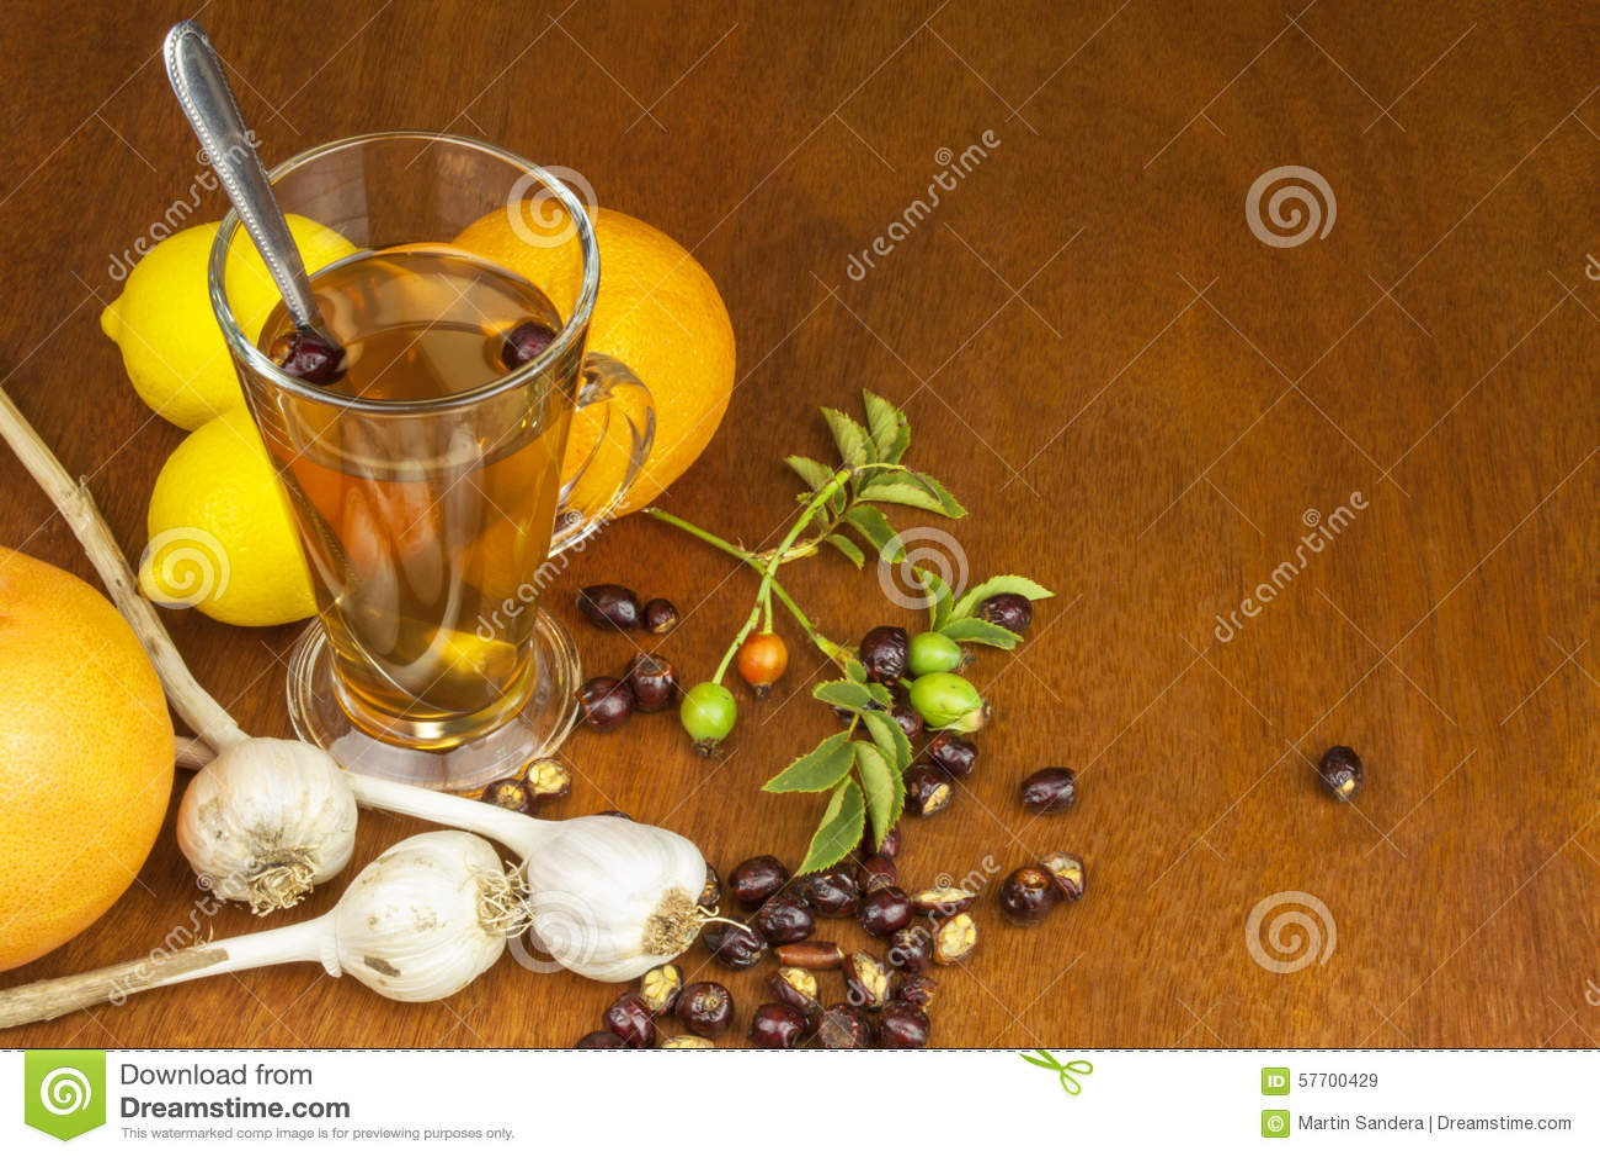 how to make garlic honey lemon tea